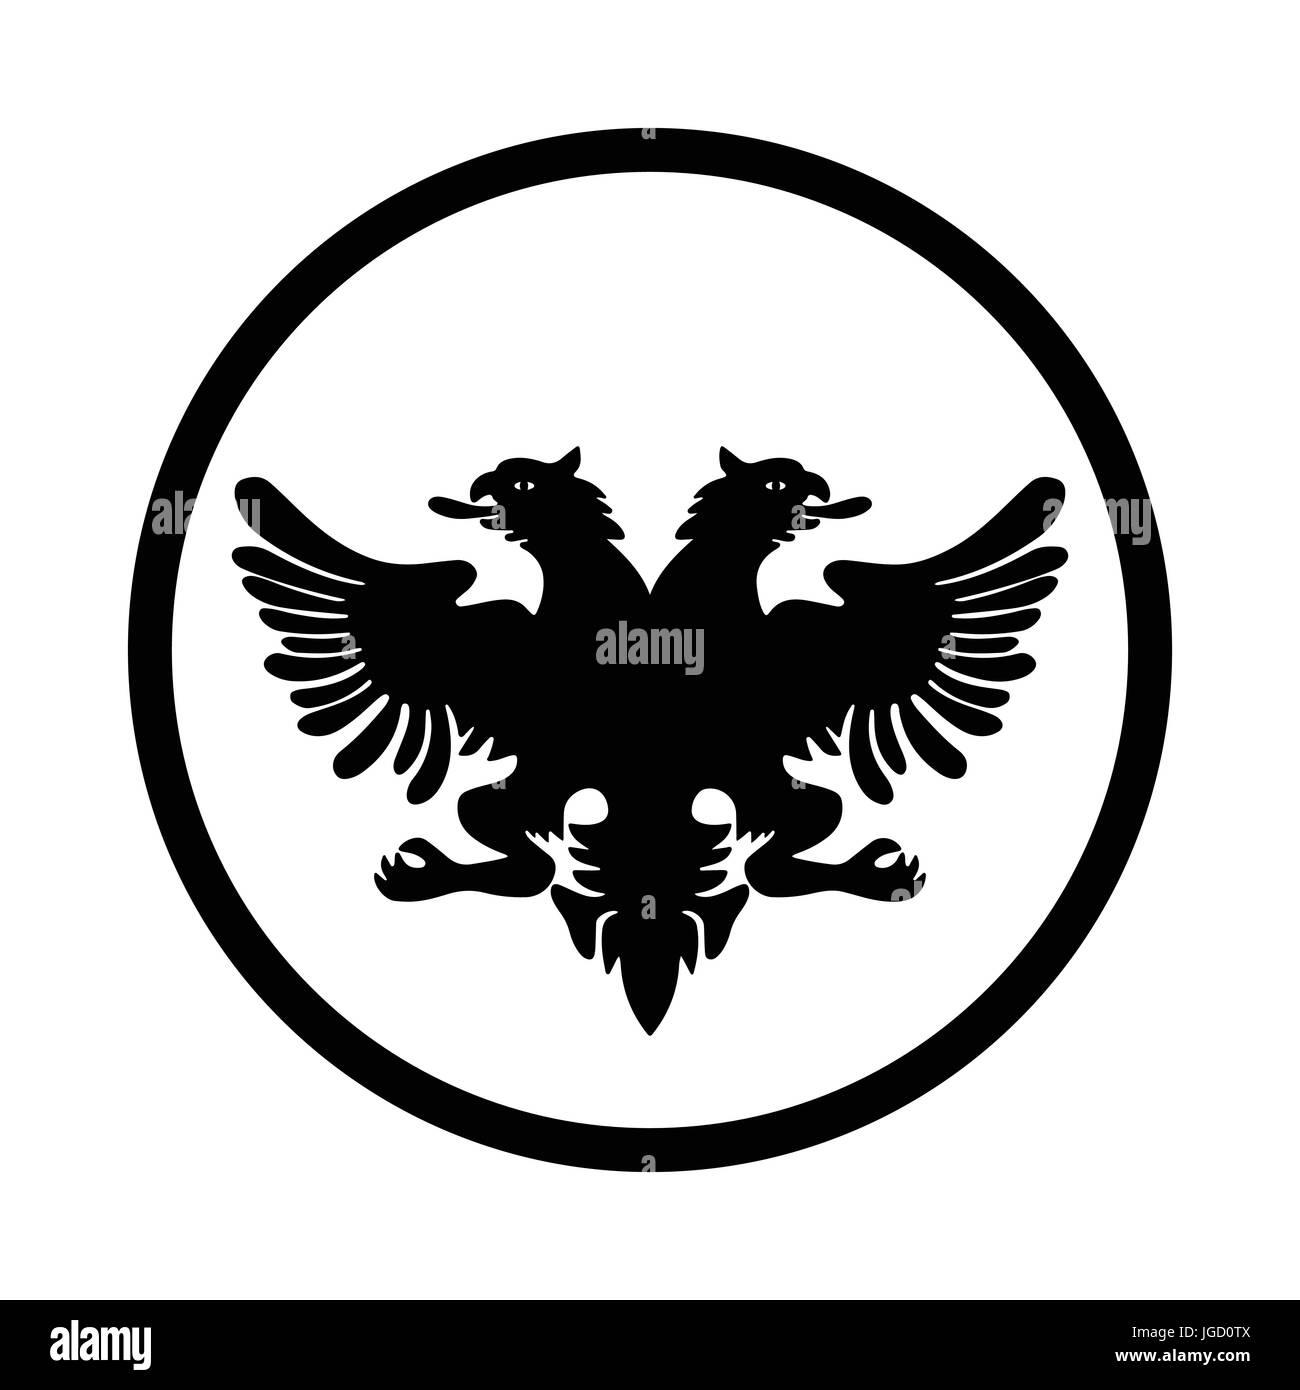 Symbol of Albania icon, iconic symbol inside a circle, on white background. Vector Iconic Design. - Stock Image